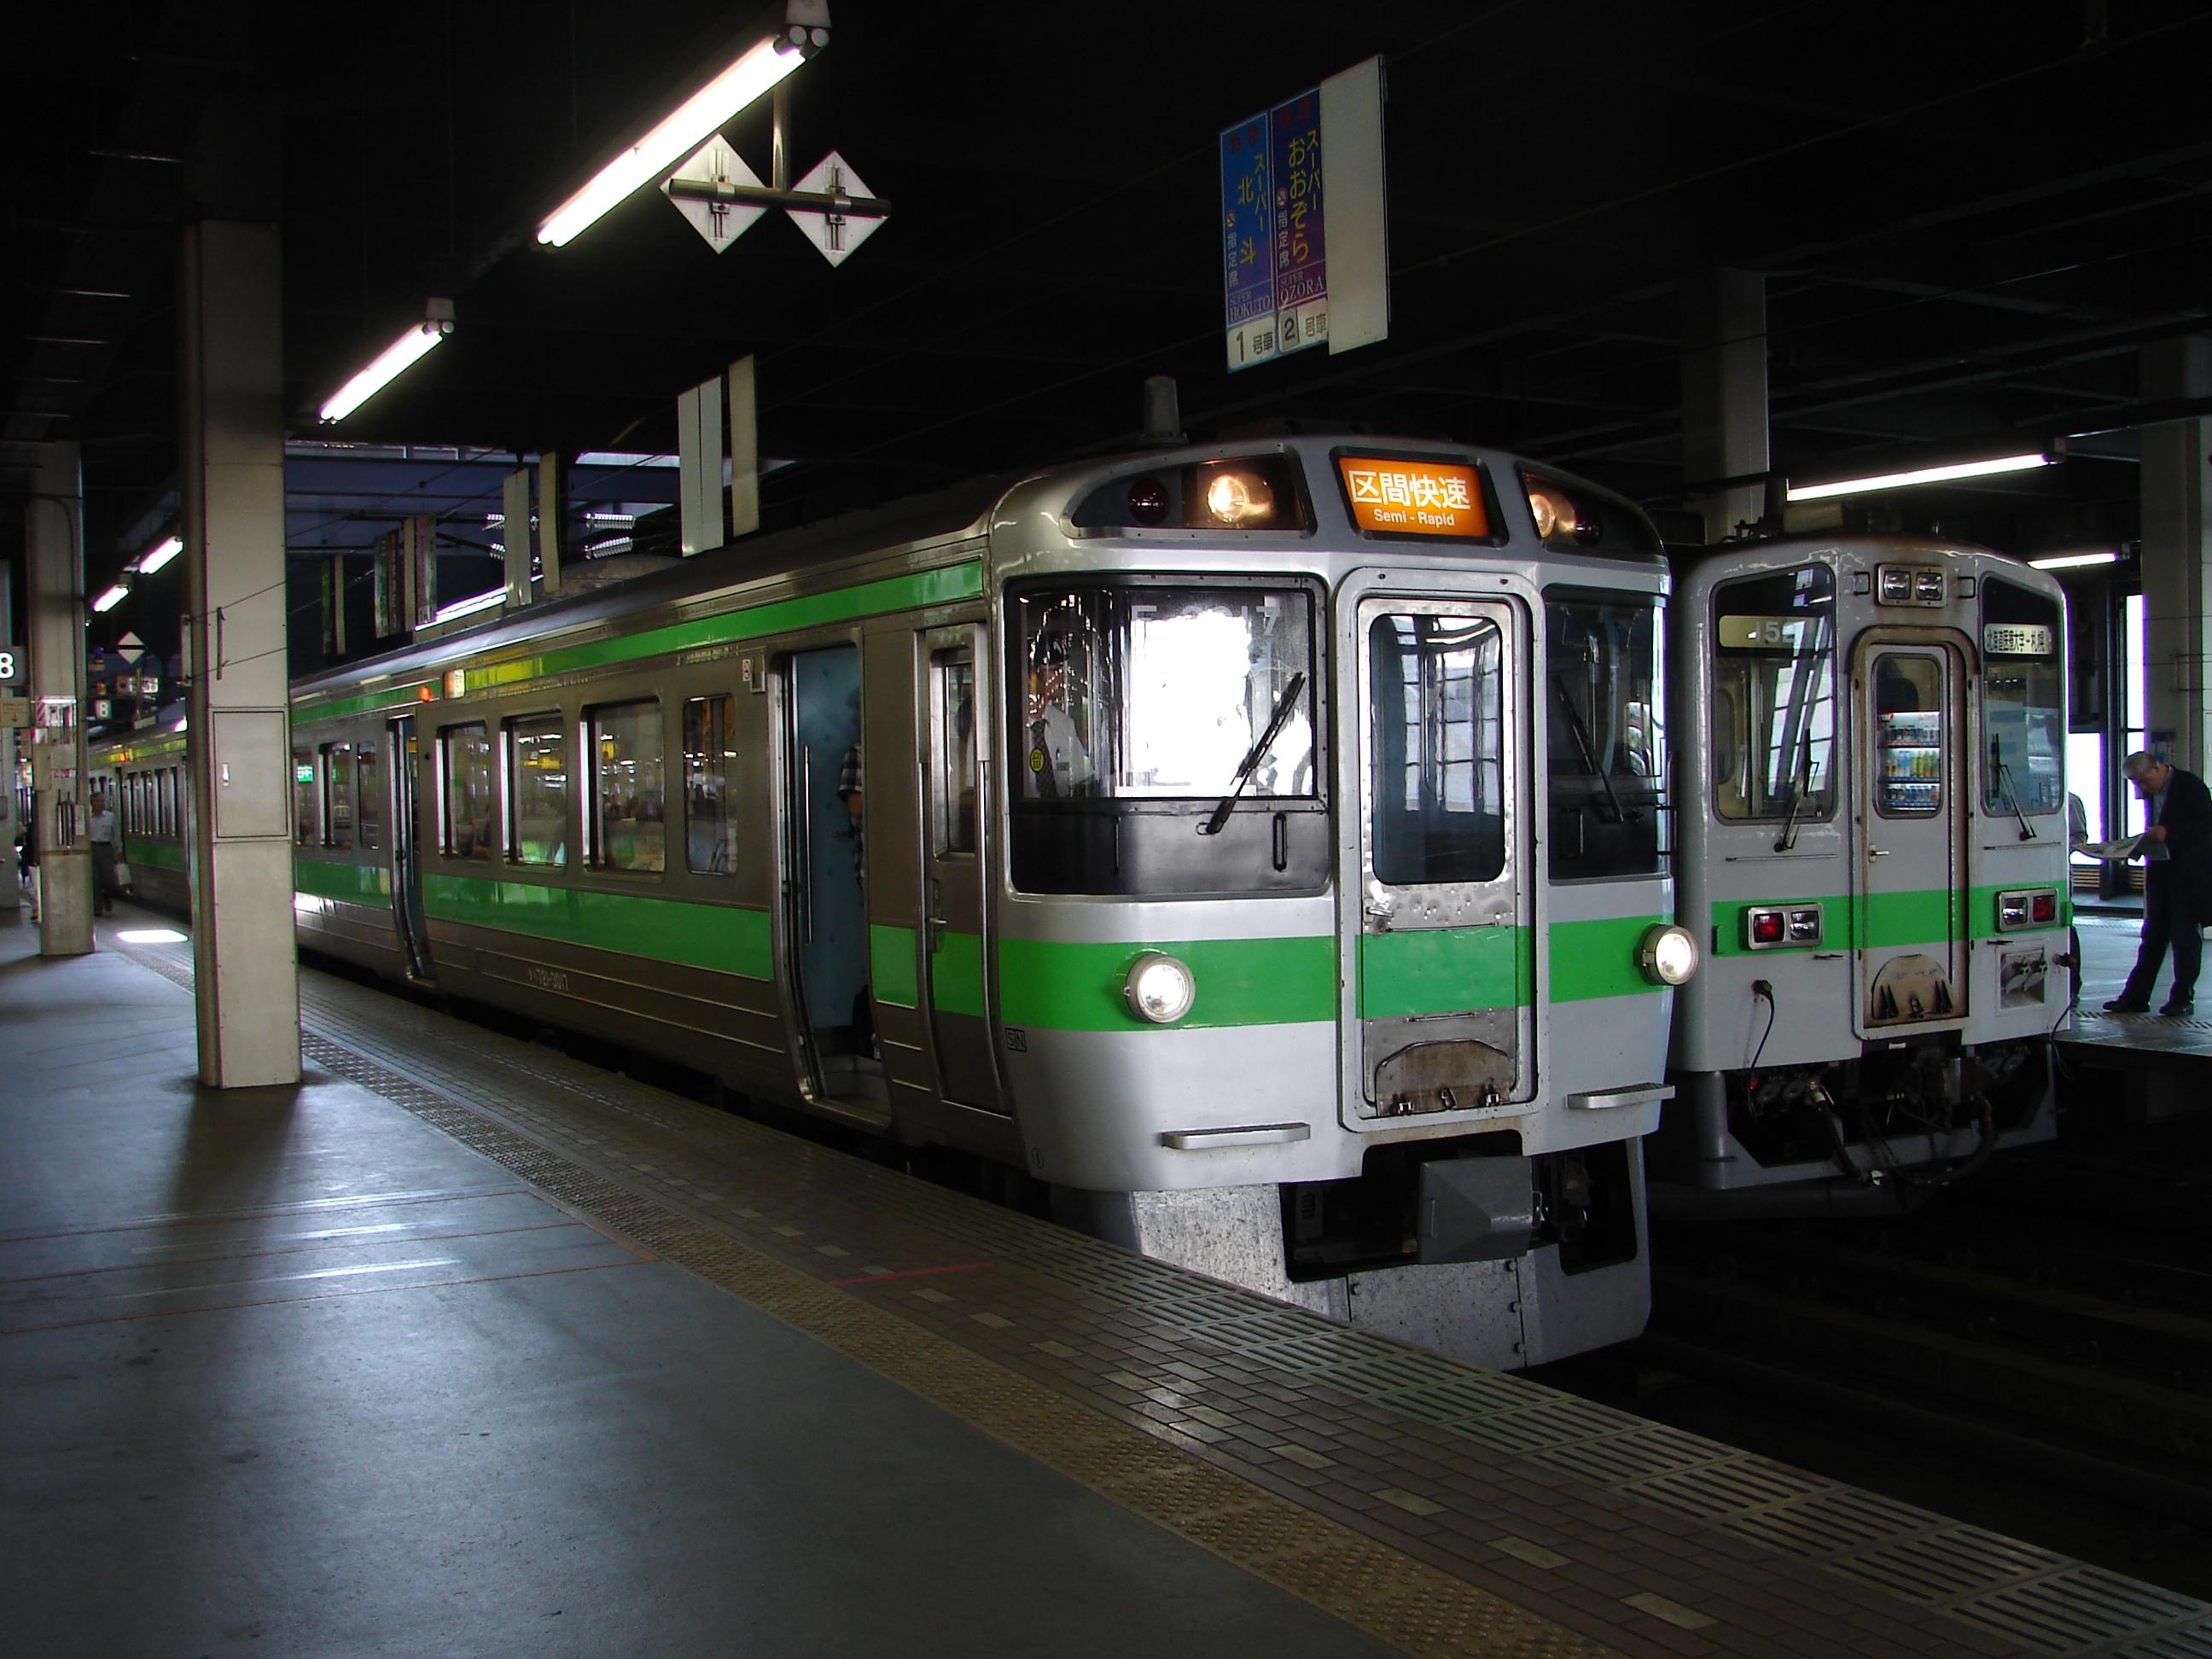 JR北海道キハ141系気動車 - KiHa 141 series